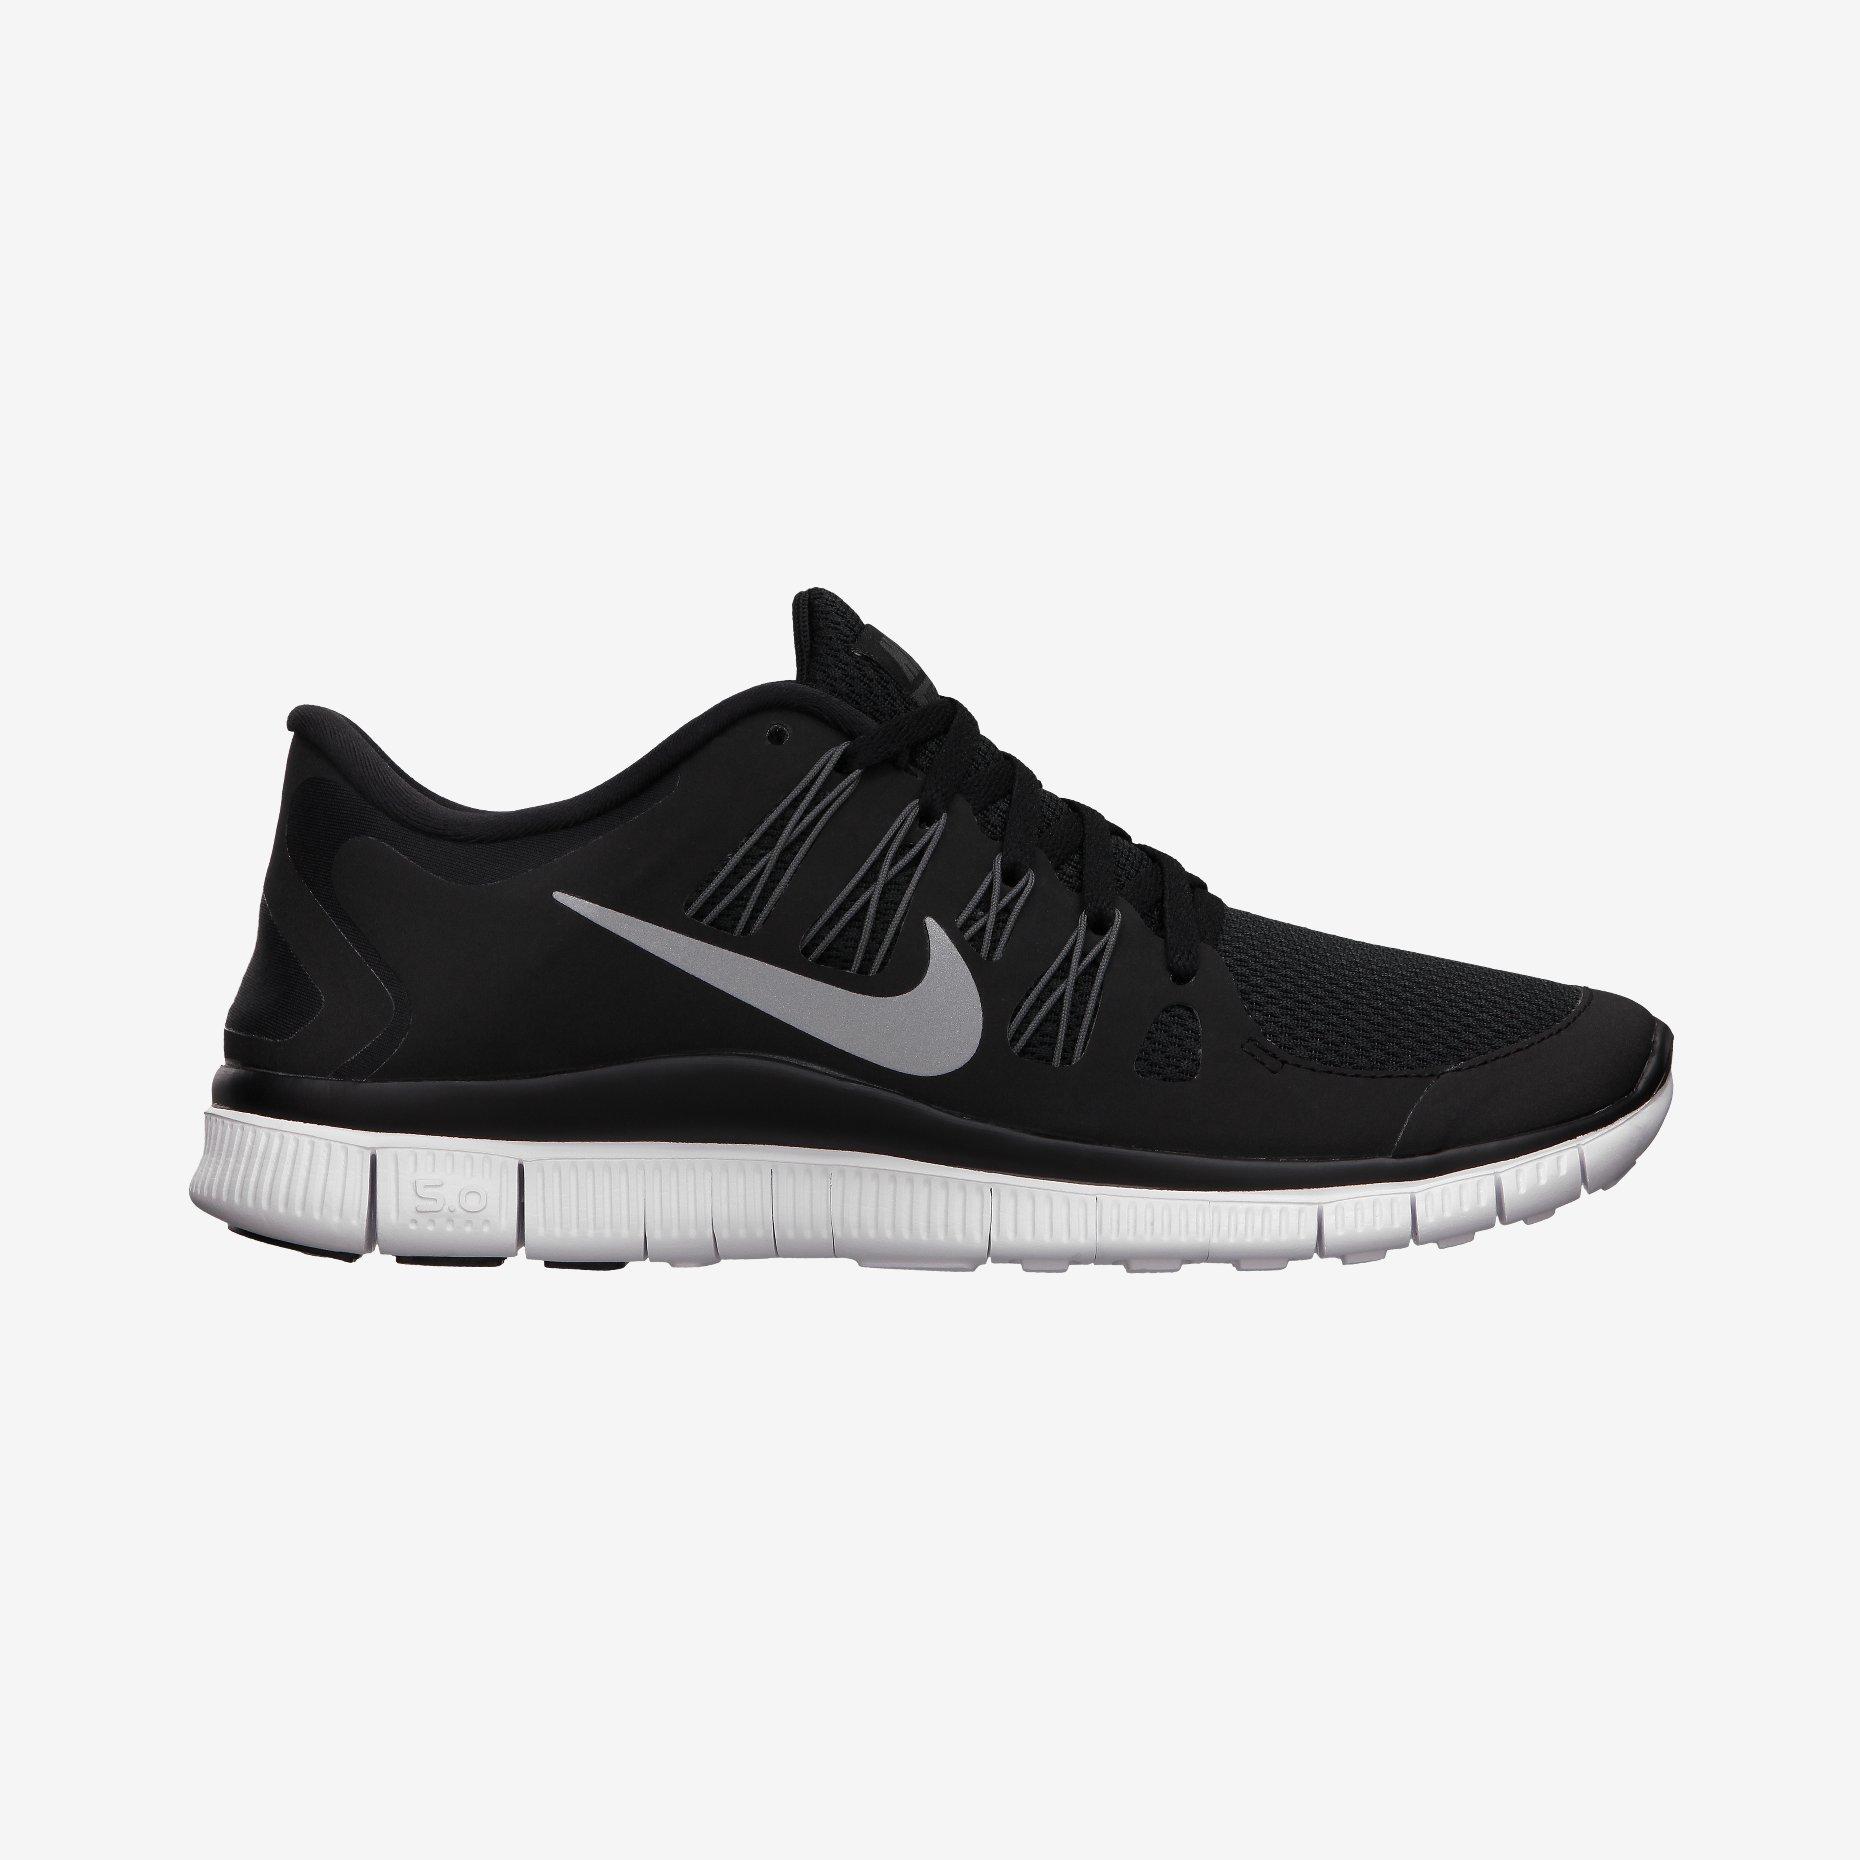 Nike Free 5.0 store